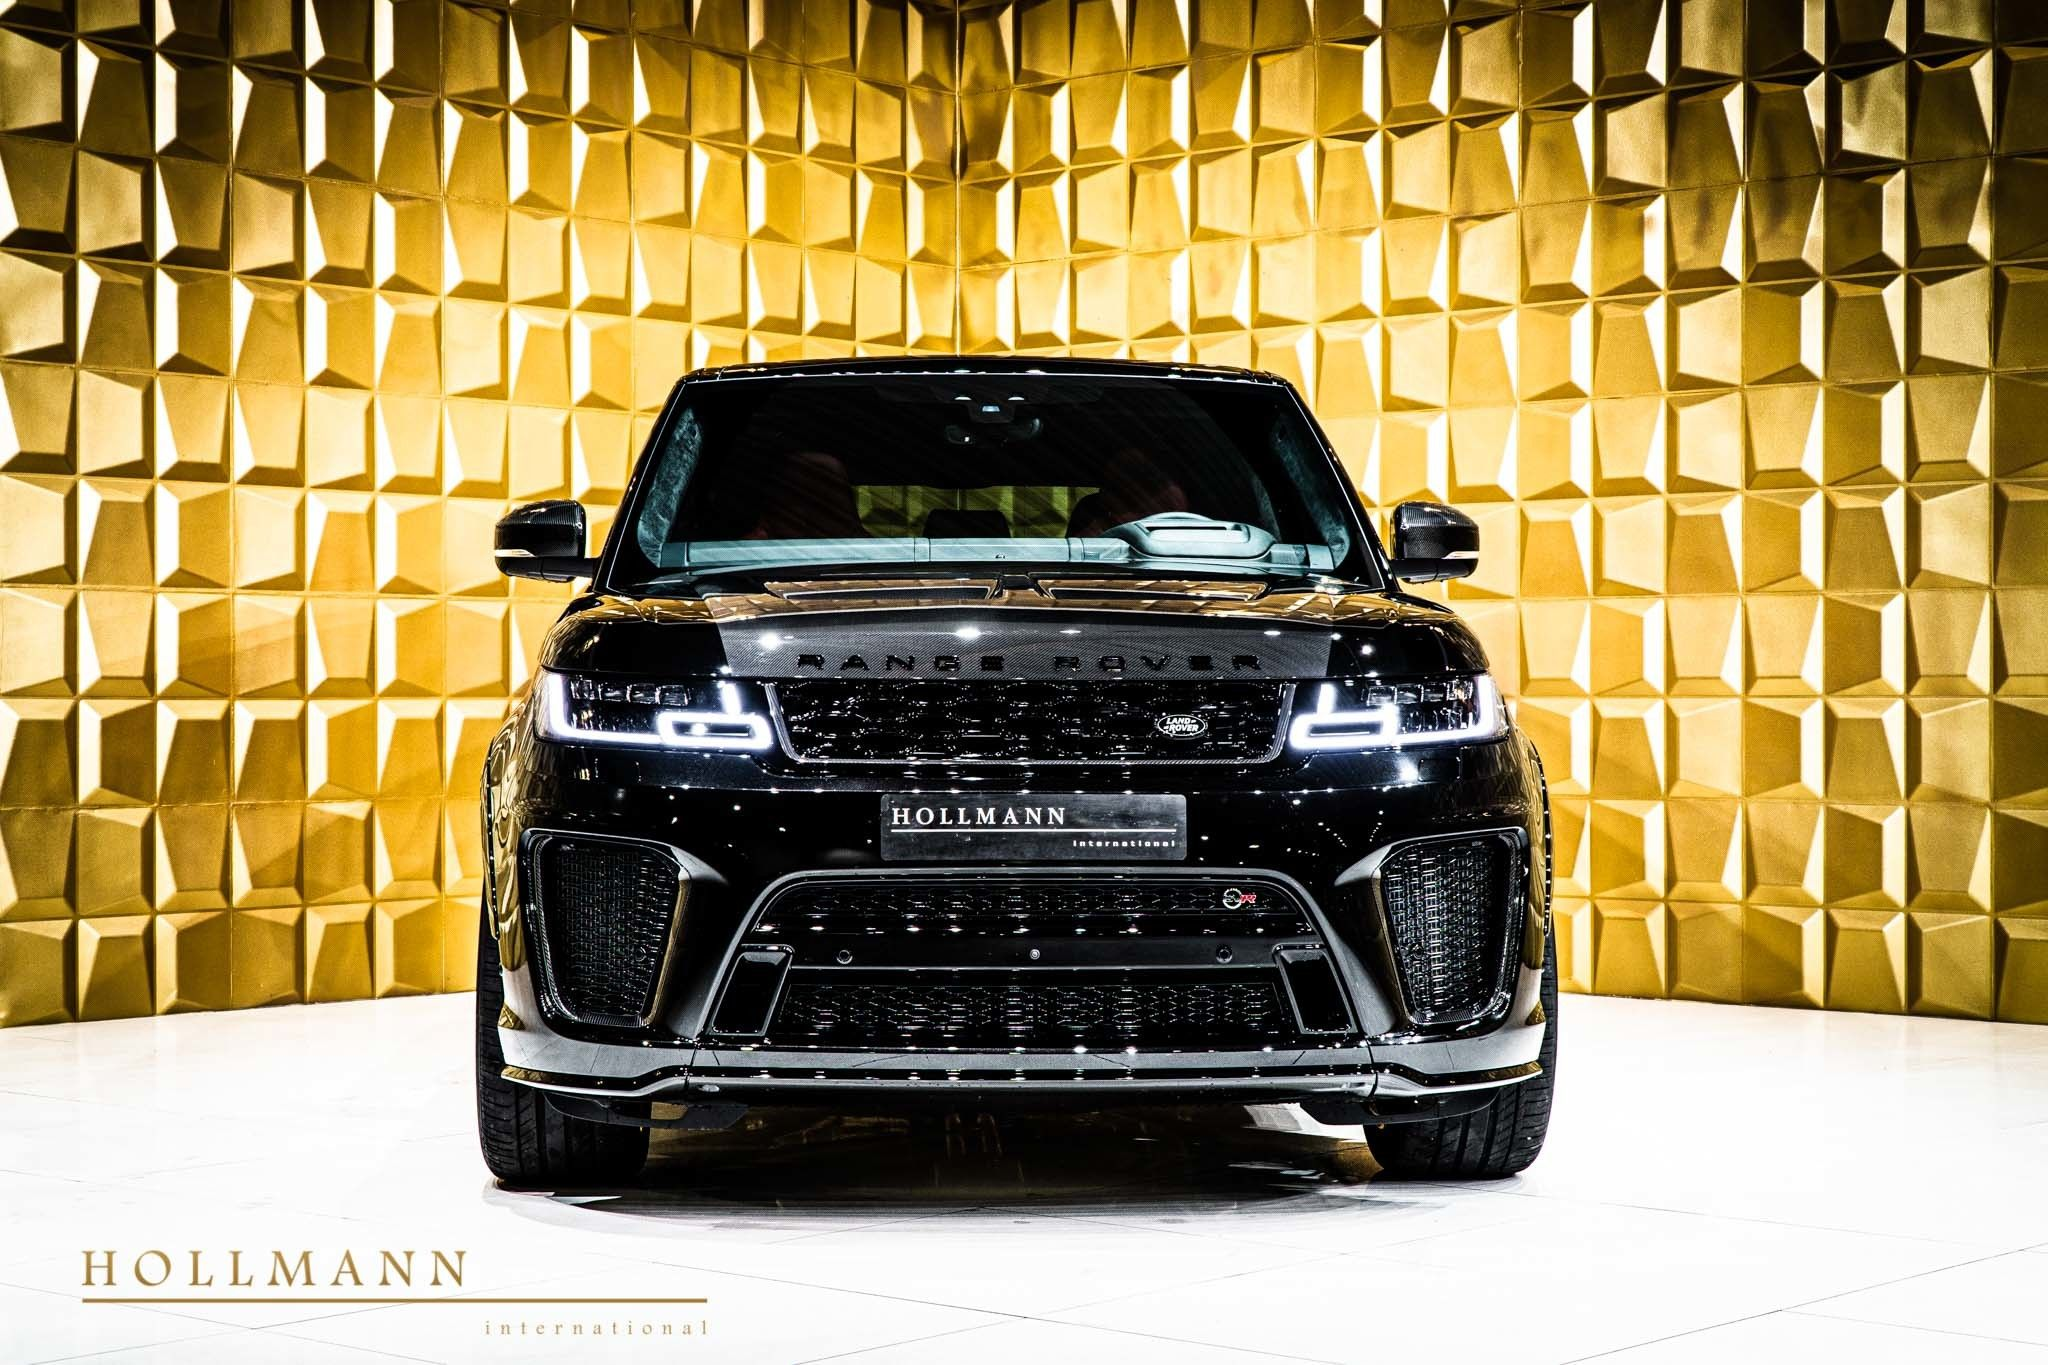 Land Rover Range Rover Sport 5 0 V8 Svr Hollmann International Germany For Sale On Luxurypulse In 2020 Range Rover Sport Range Rover Land Rover